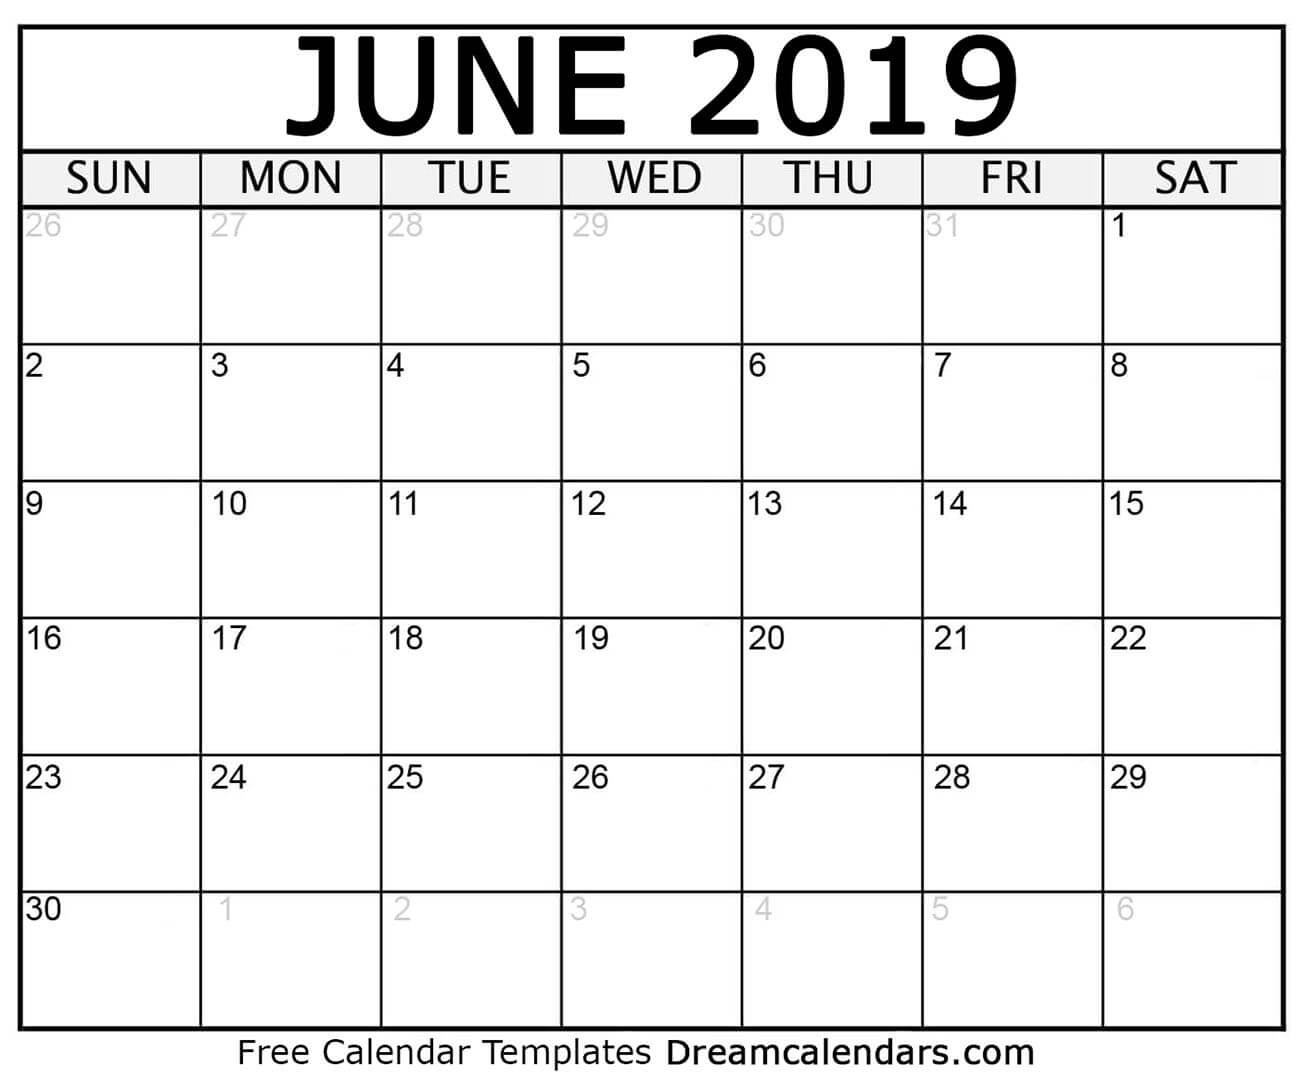 Printable June 2019 Calendar-Us Printable Blank Calendars